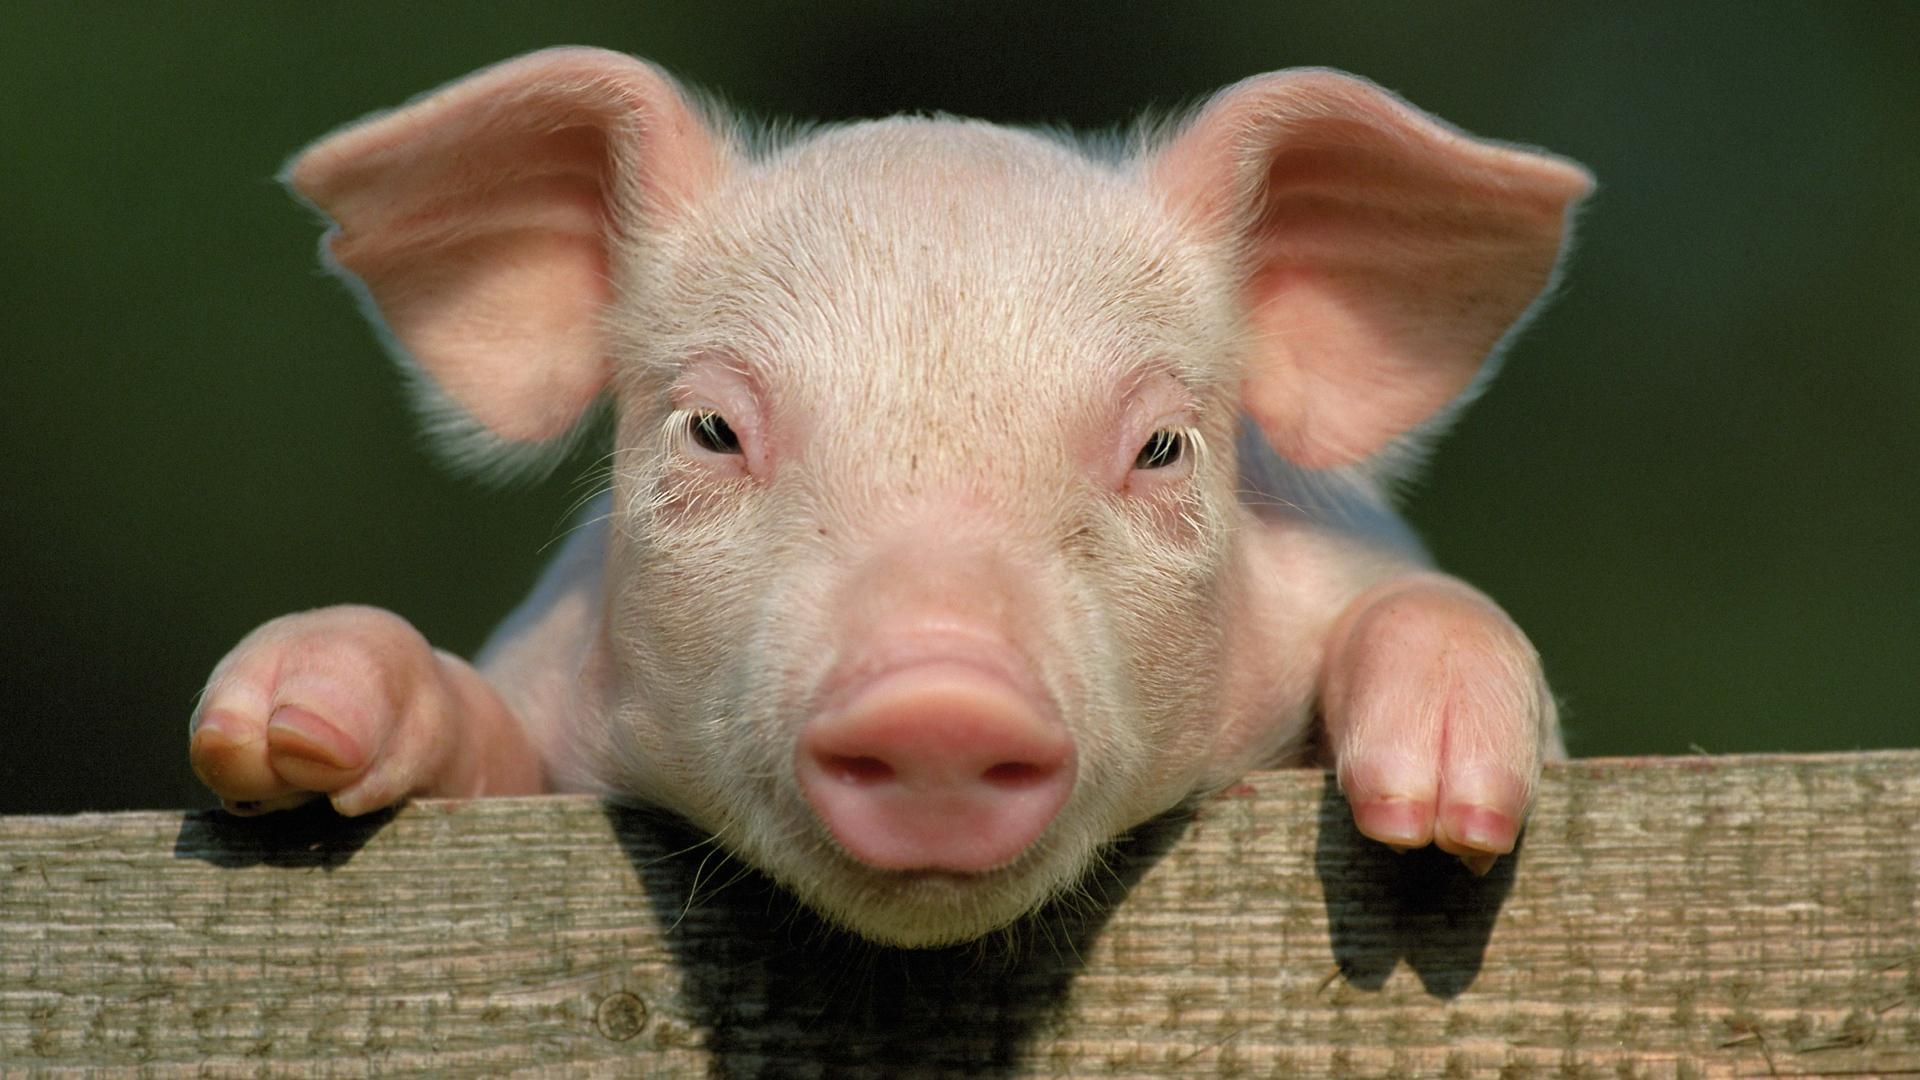 pig - ThingLink